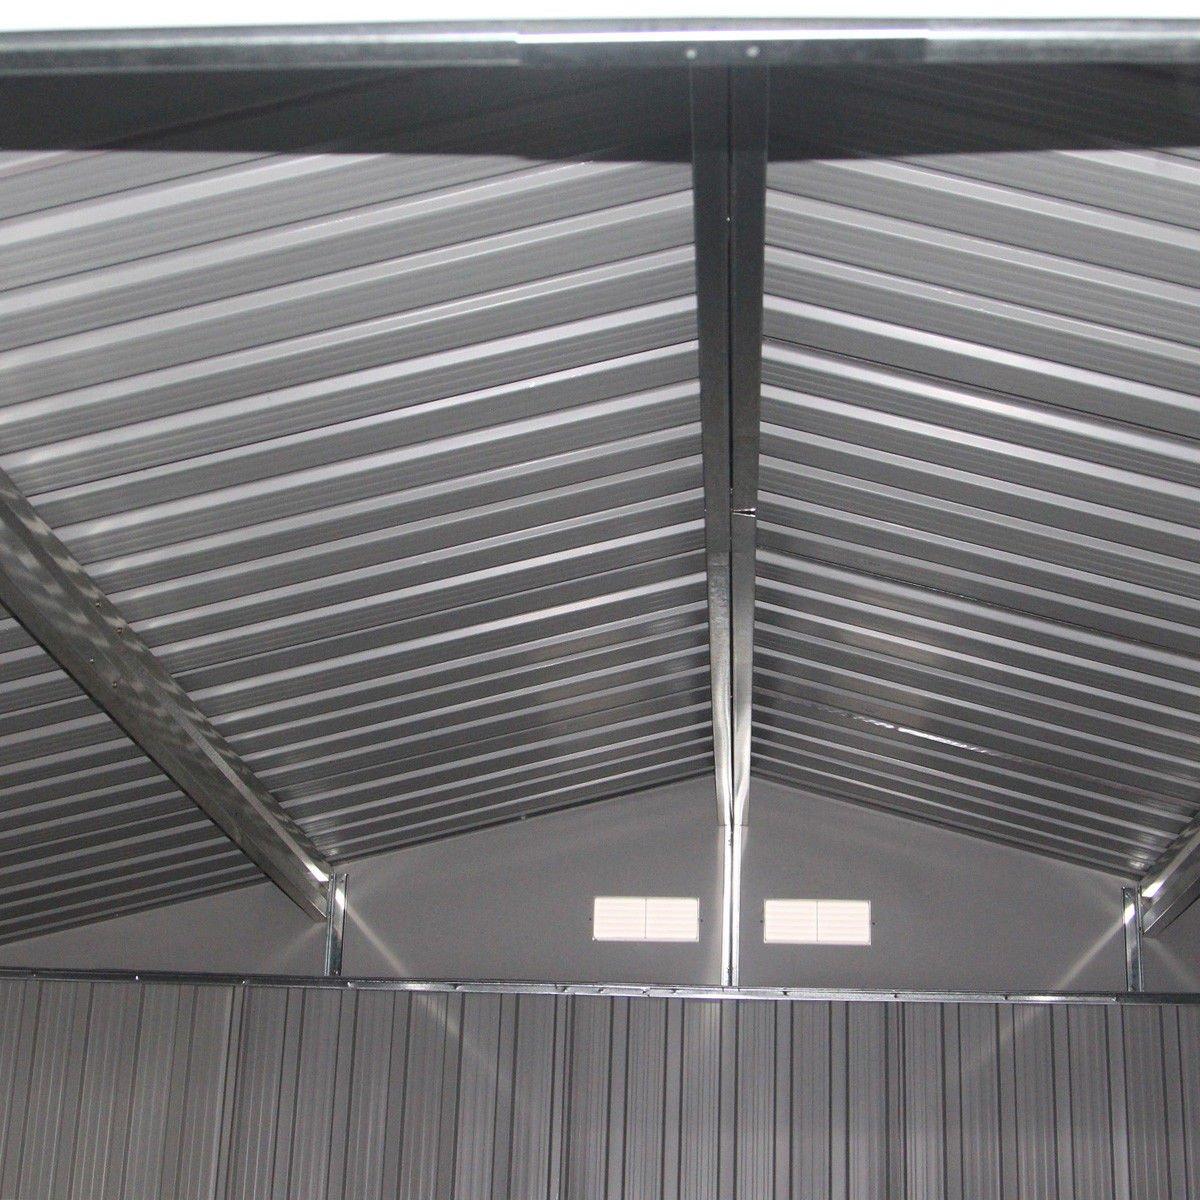 9' X 6' Outdoor Garden Storage Shed Tool House Sliding Door Steel Khaki New by tamsun (Image #7)